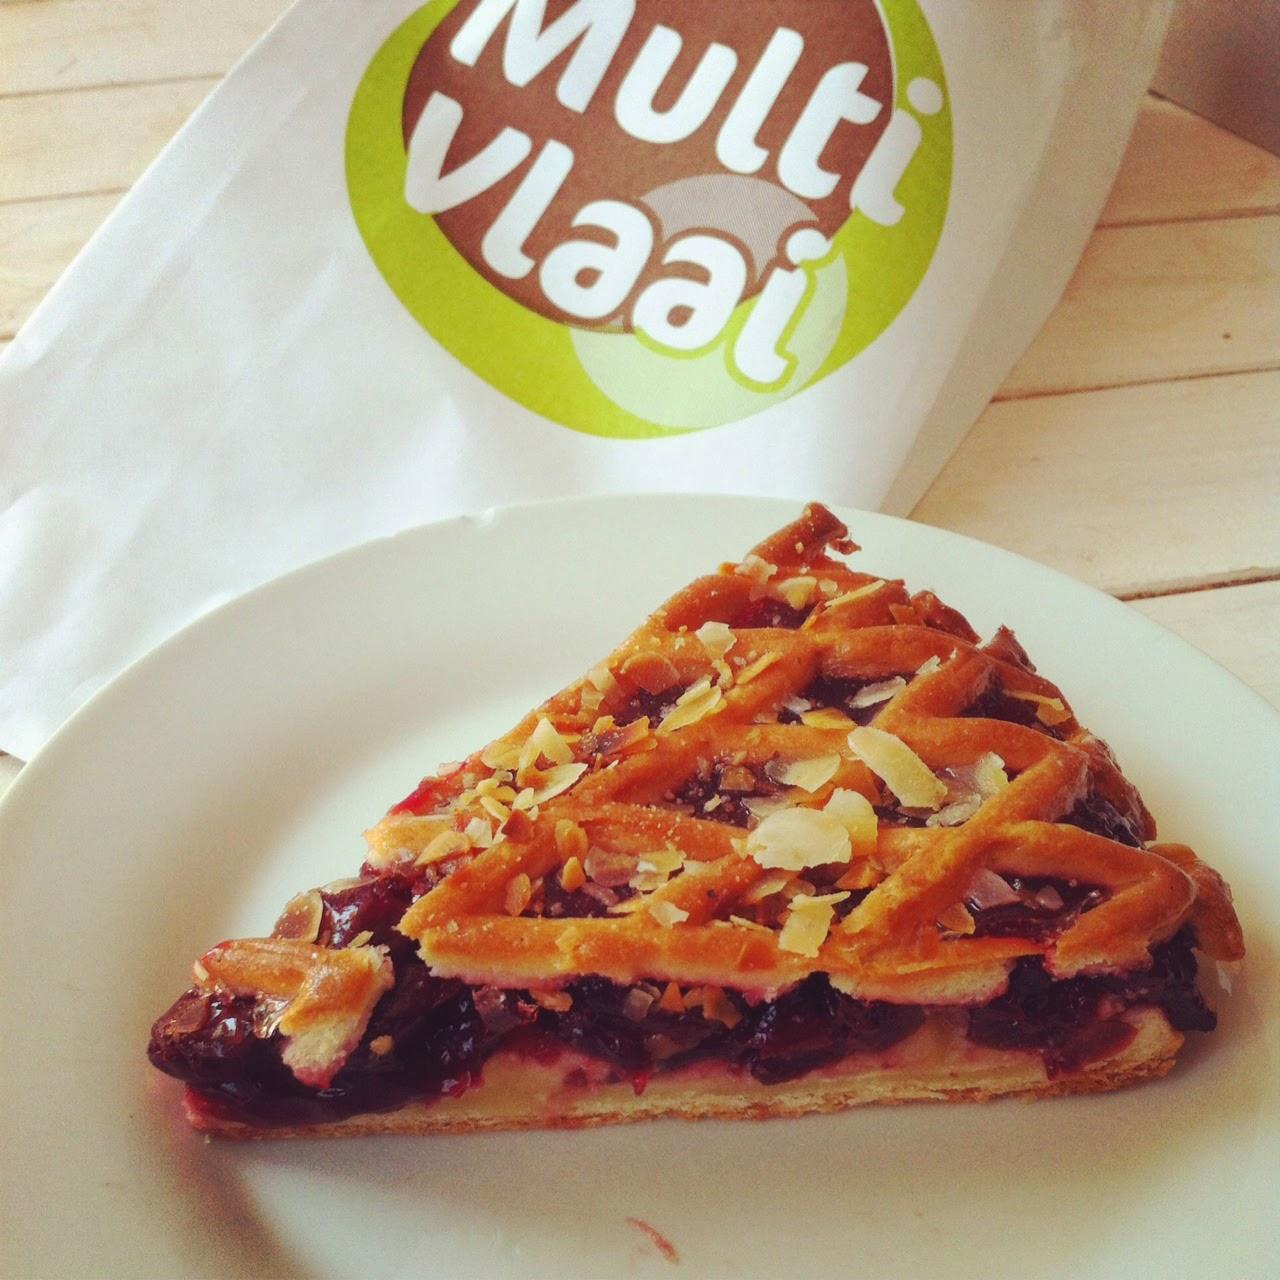 taart met foto bestellen multivlaai Multivlaai Cake (glutenvrij)   Glutenfree Amsterdam taart met foto bestellen multivlaai